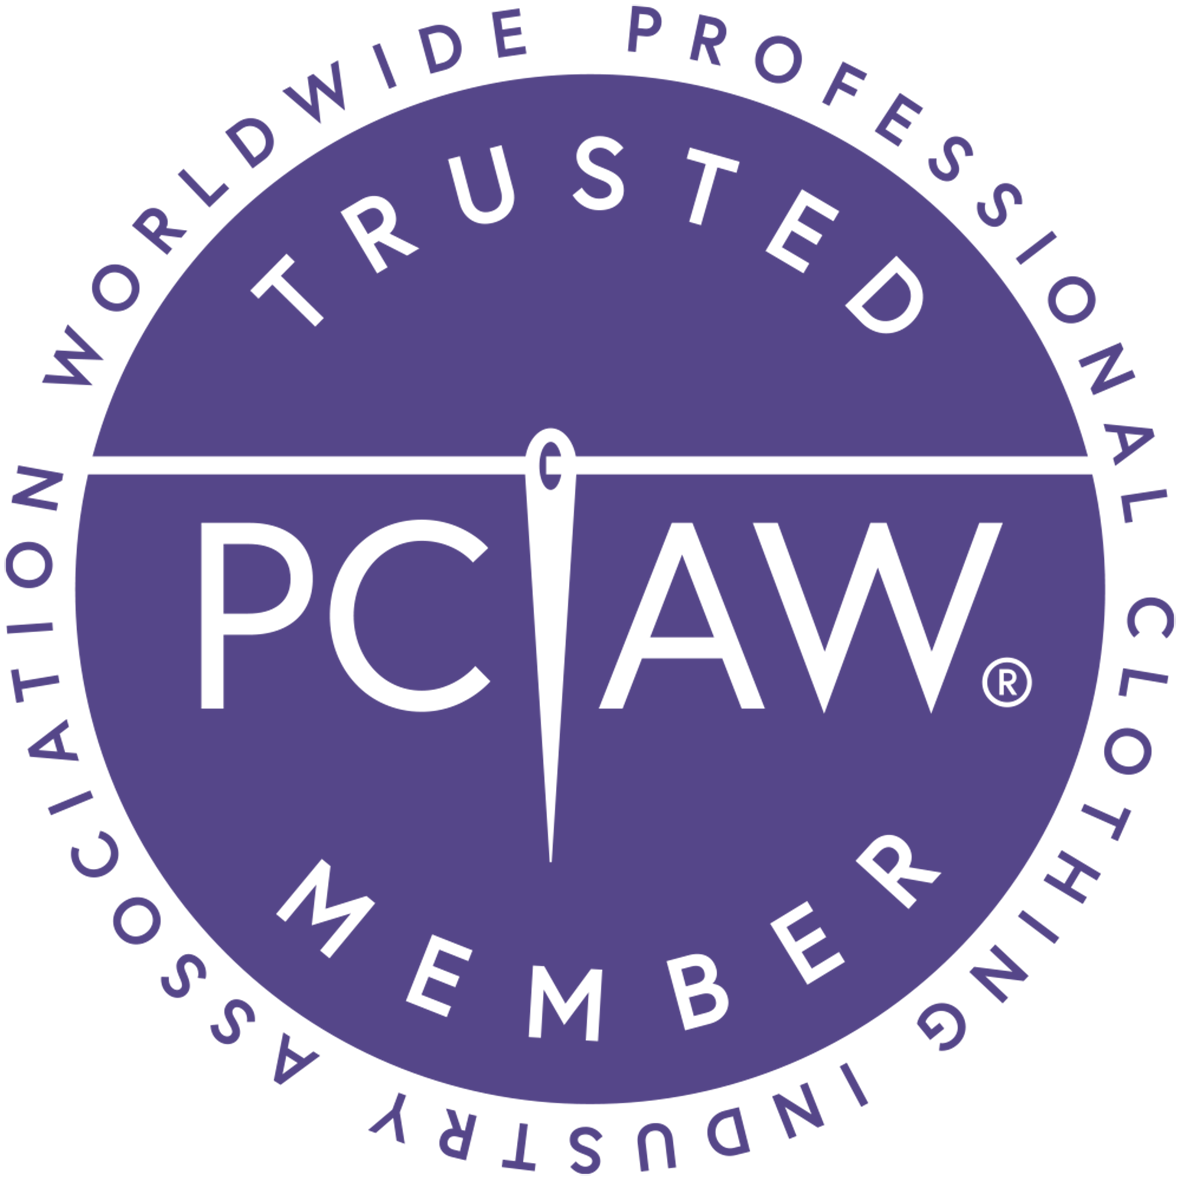 PCIAW Trust Mark logo